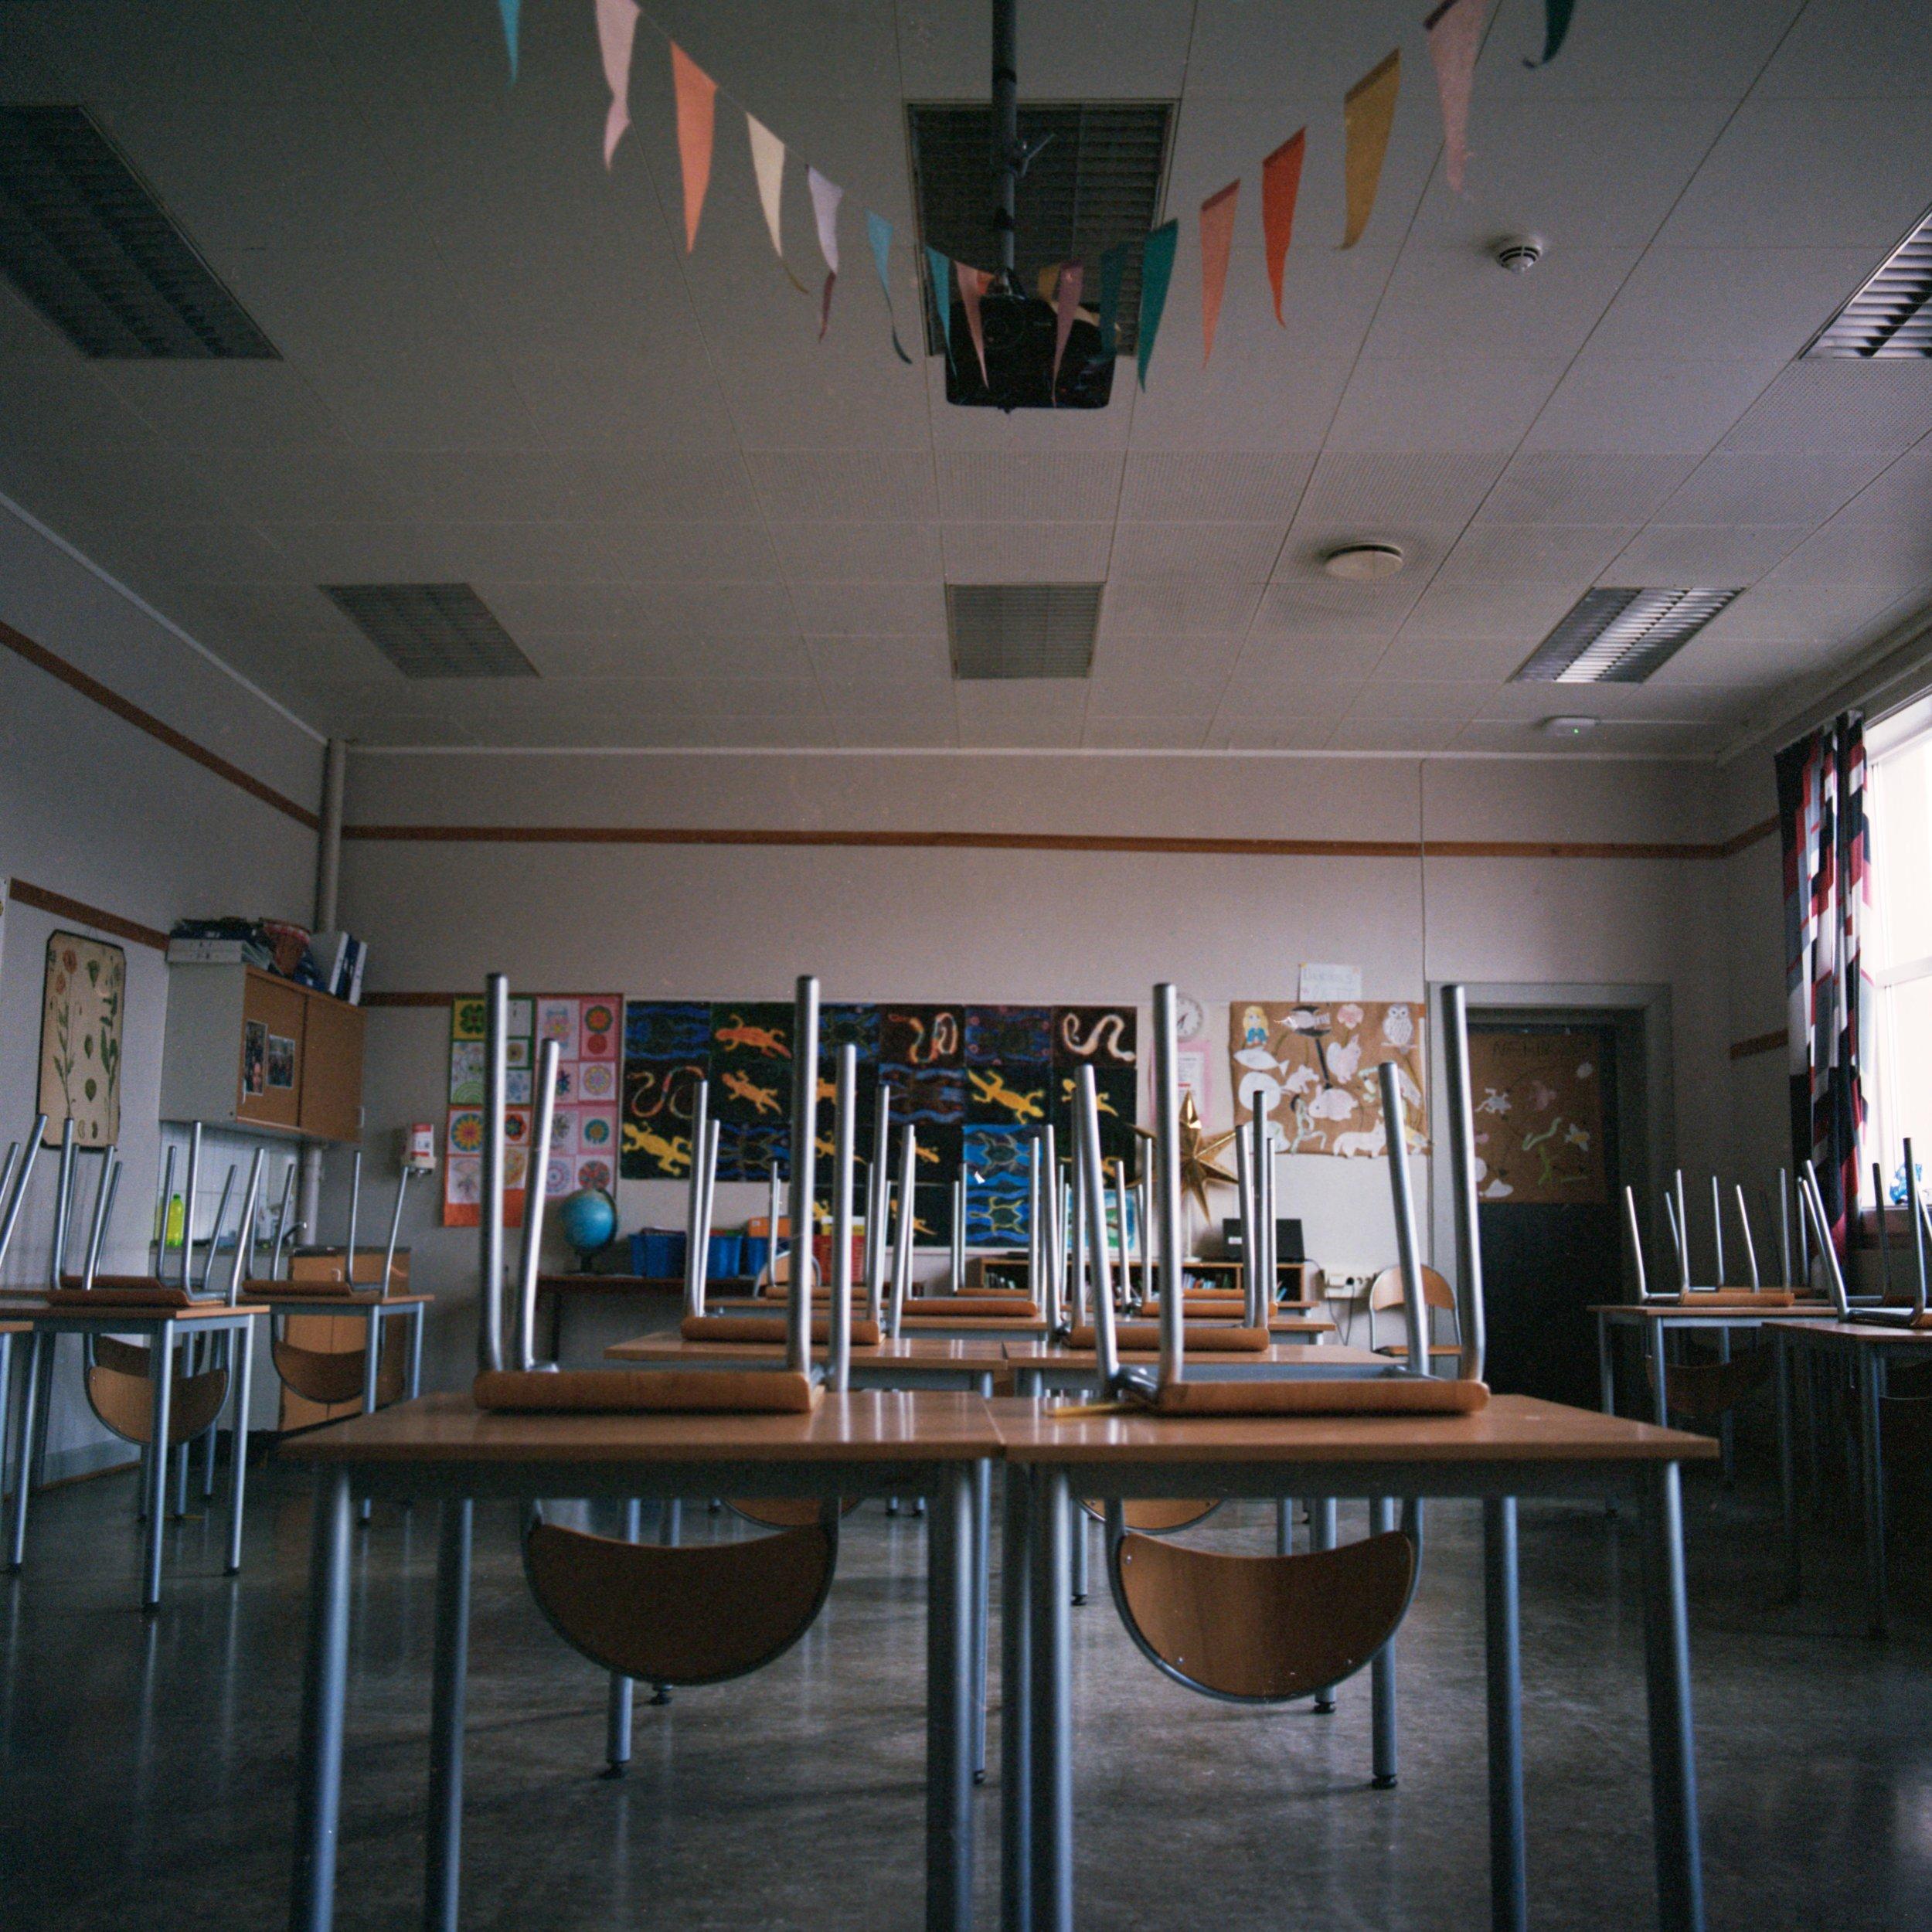 Classrooms4.jpg